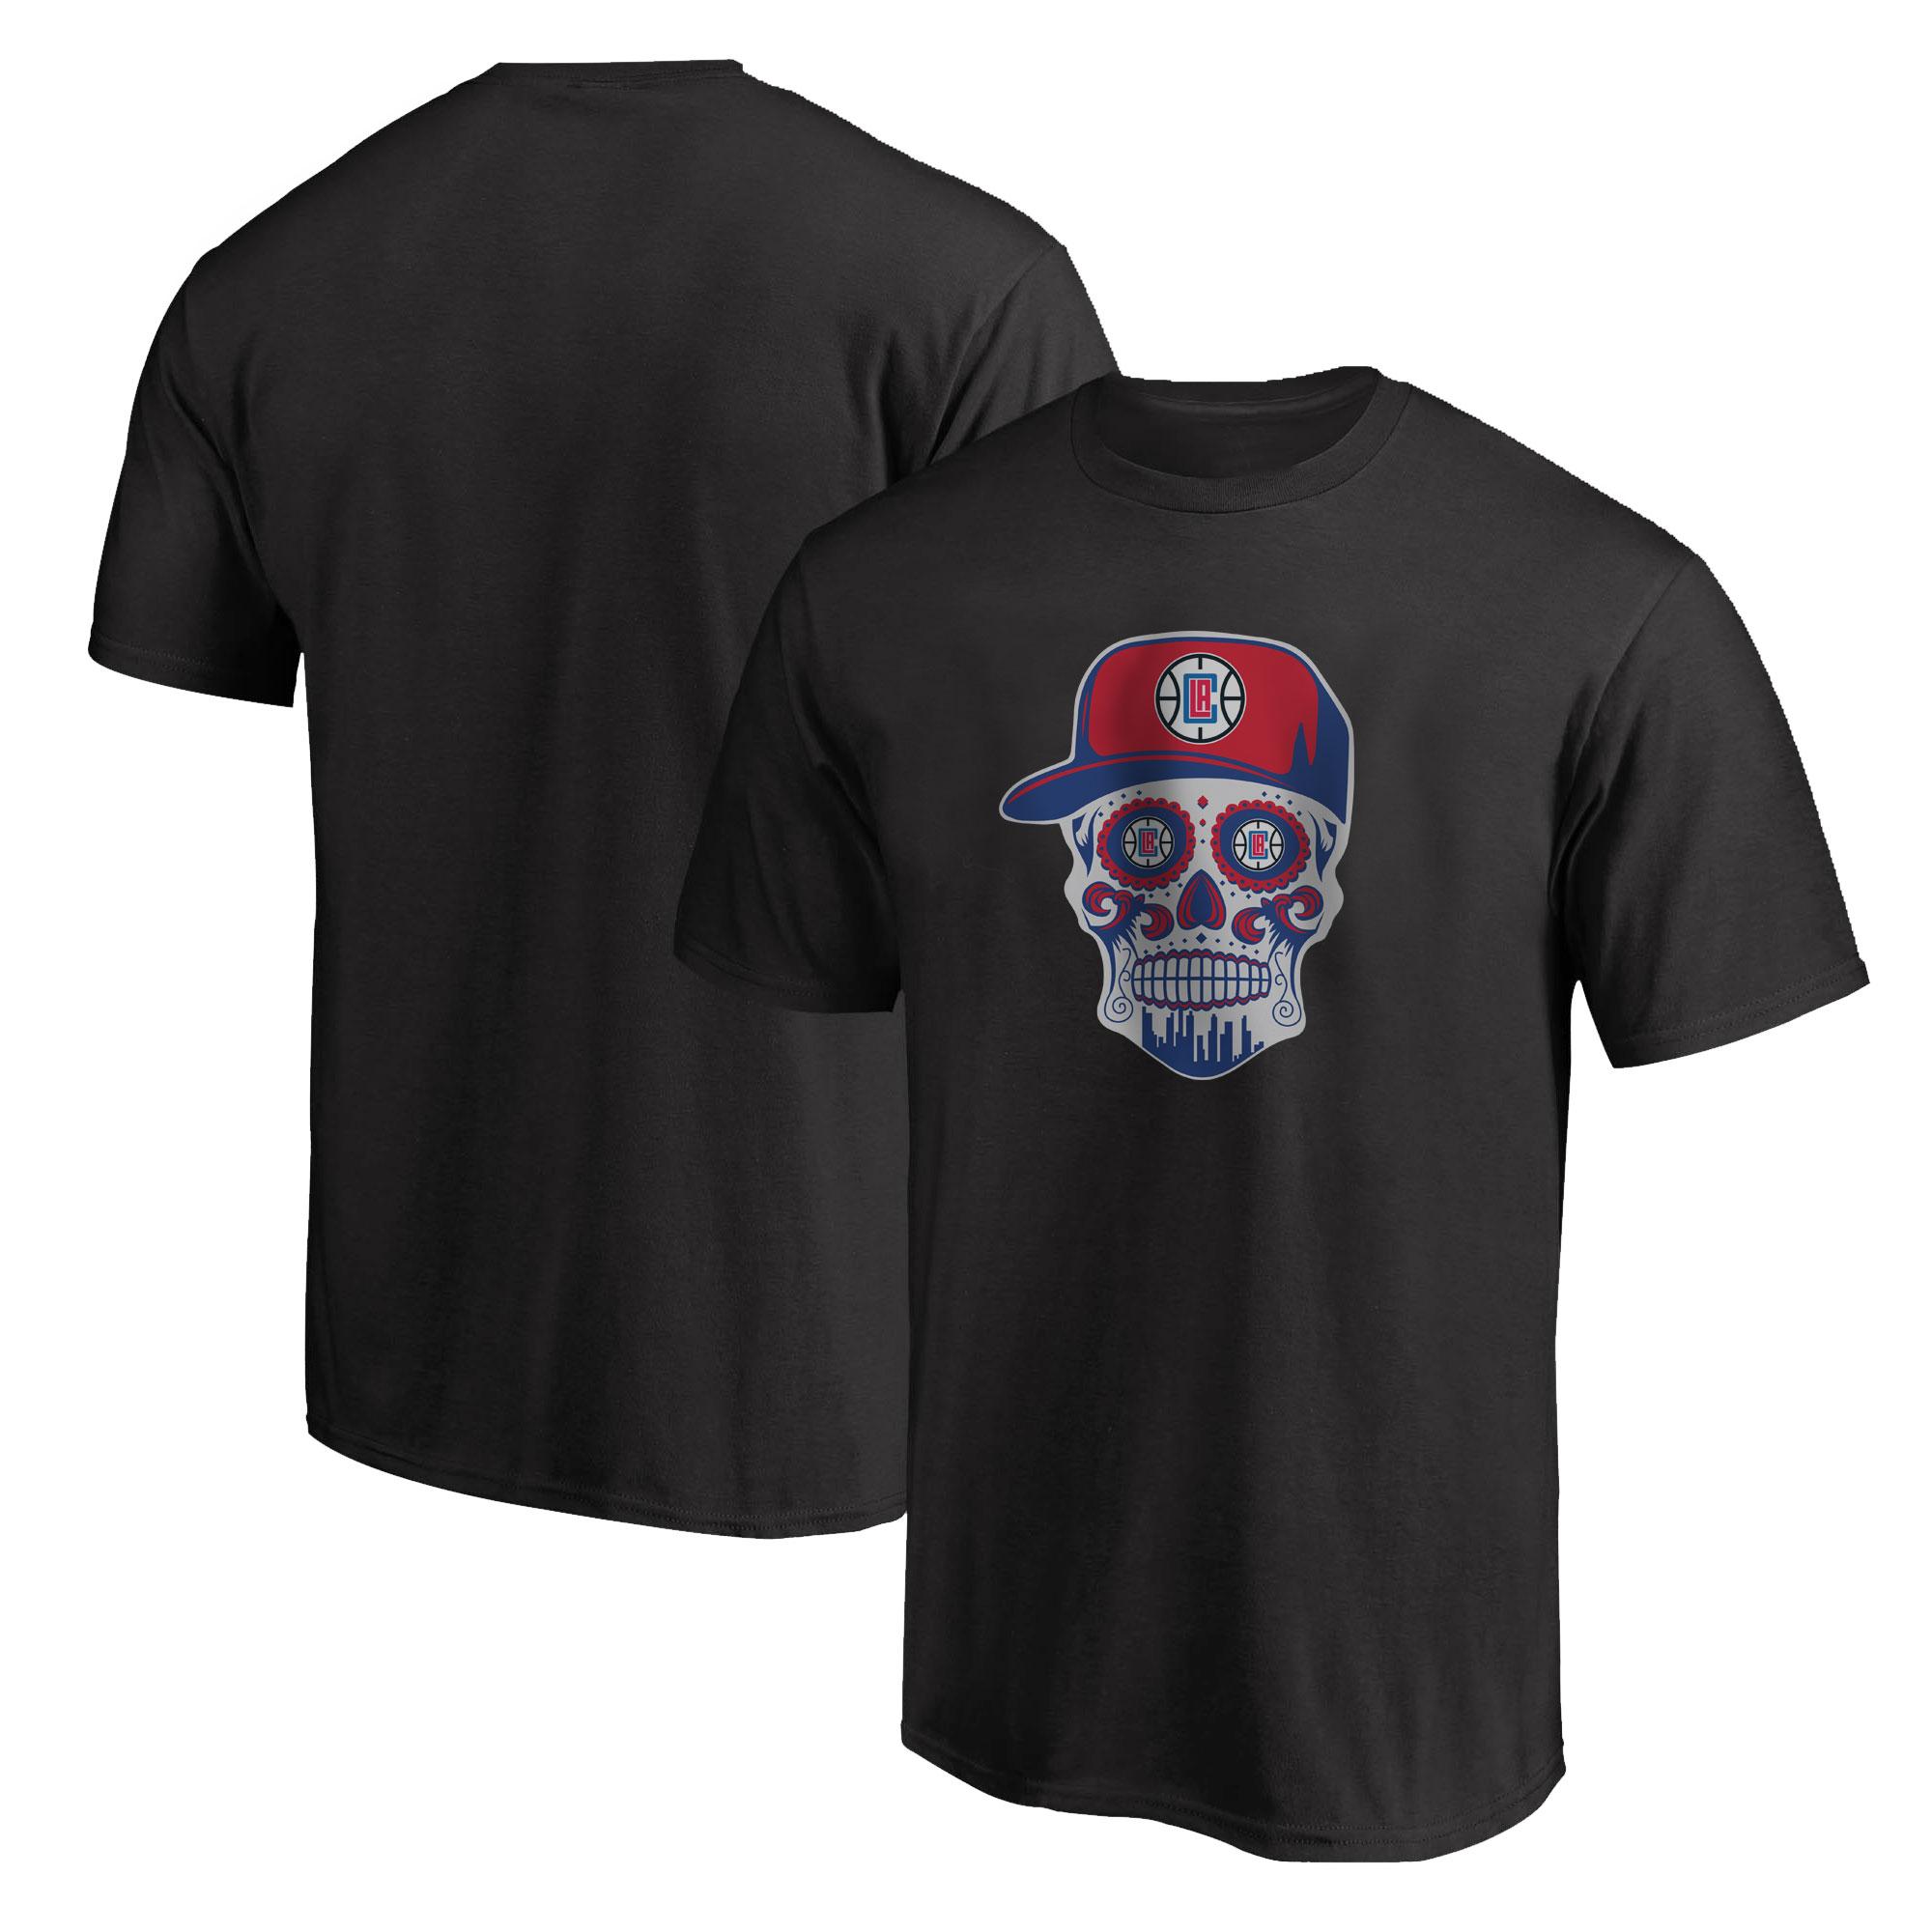 Clippers Skull Tshirt (TSH-BLC-NP-450-CLIPPERS-Skull)